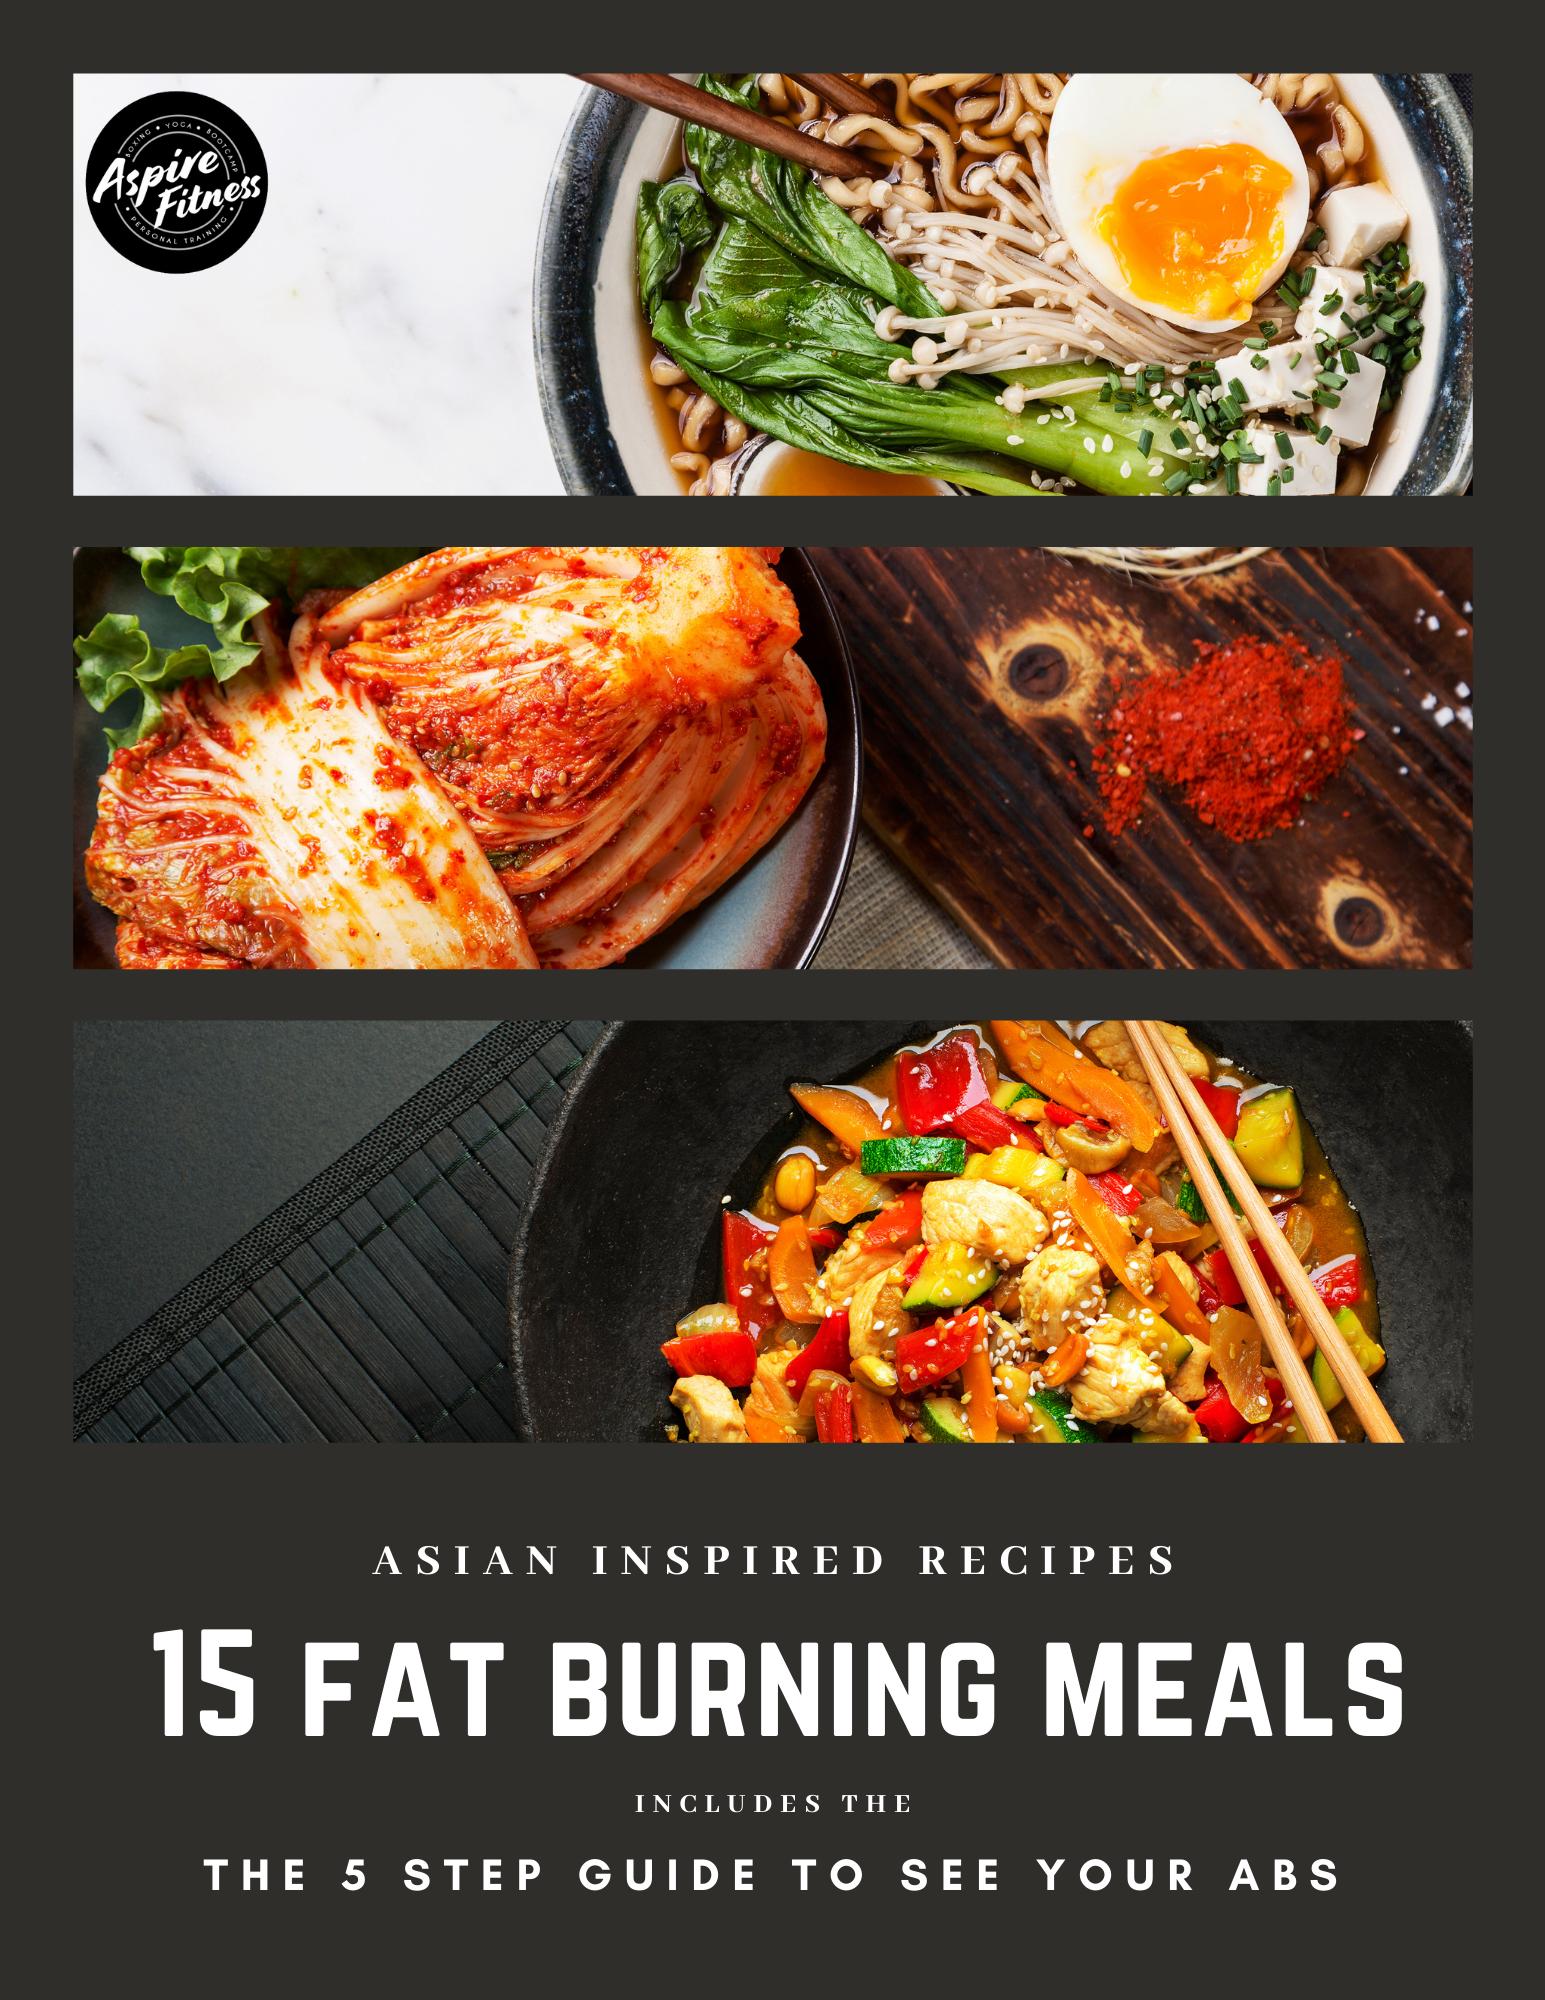 Aspire Fitness Cookbook (1).png